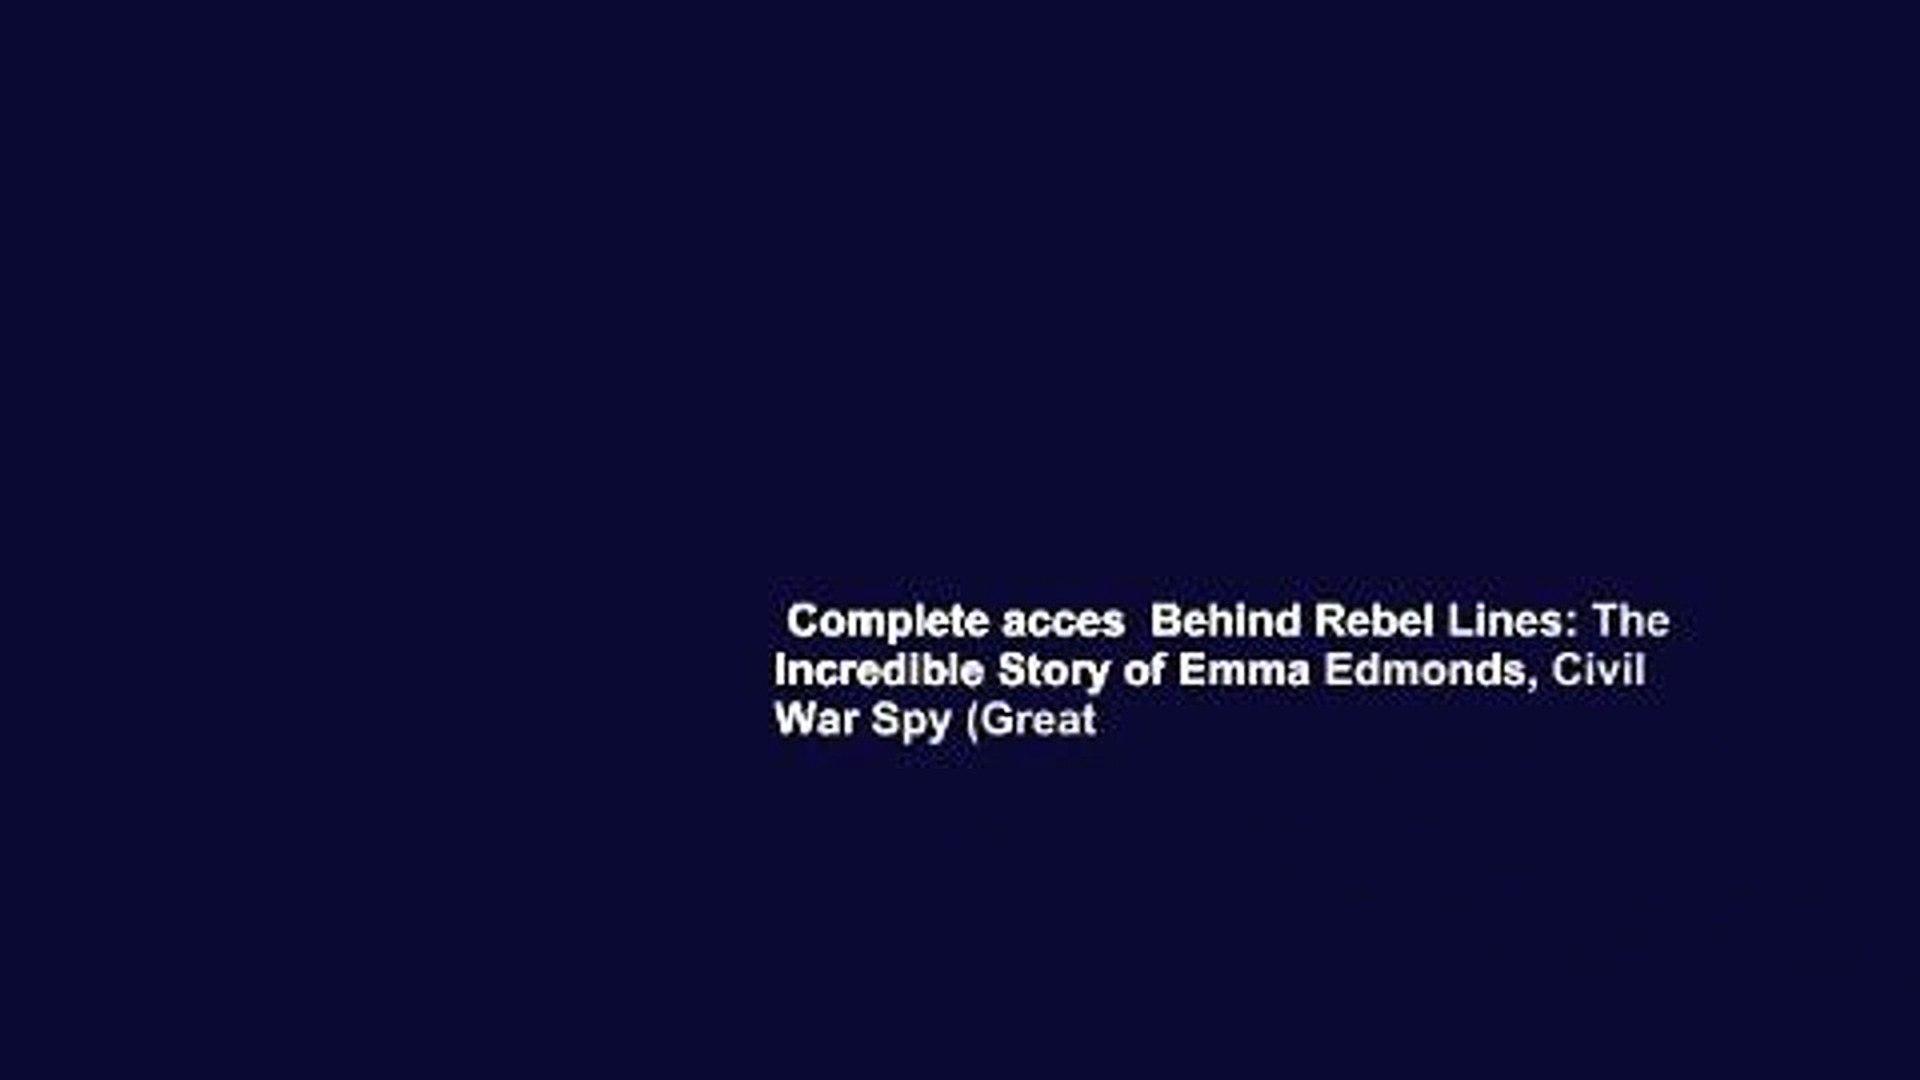 Behind Rebel Lines The Incredible Story of Emma Edmonds Civil War Spy